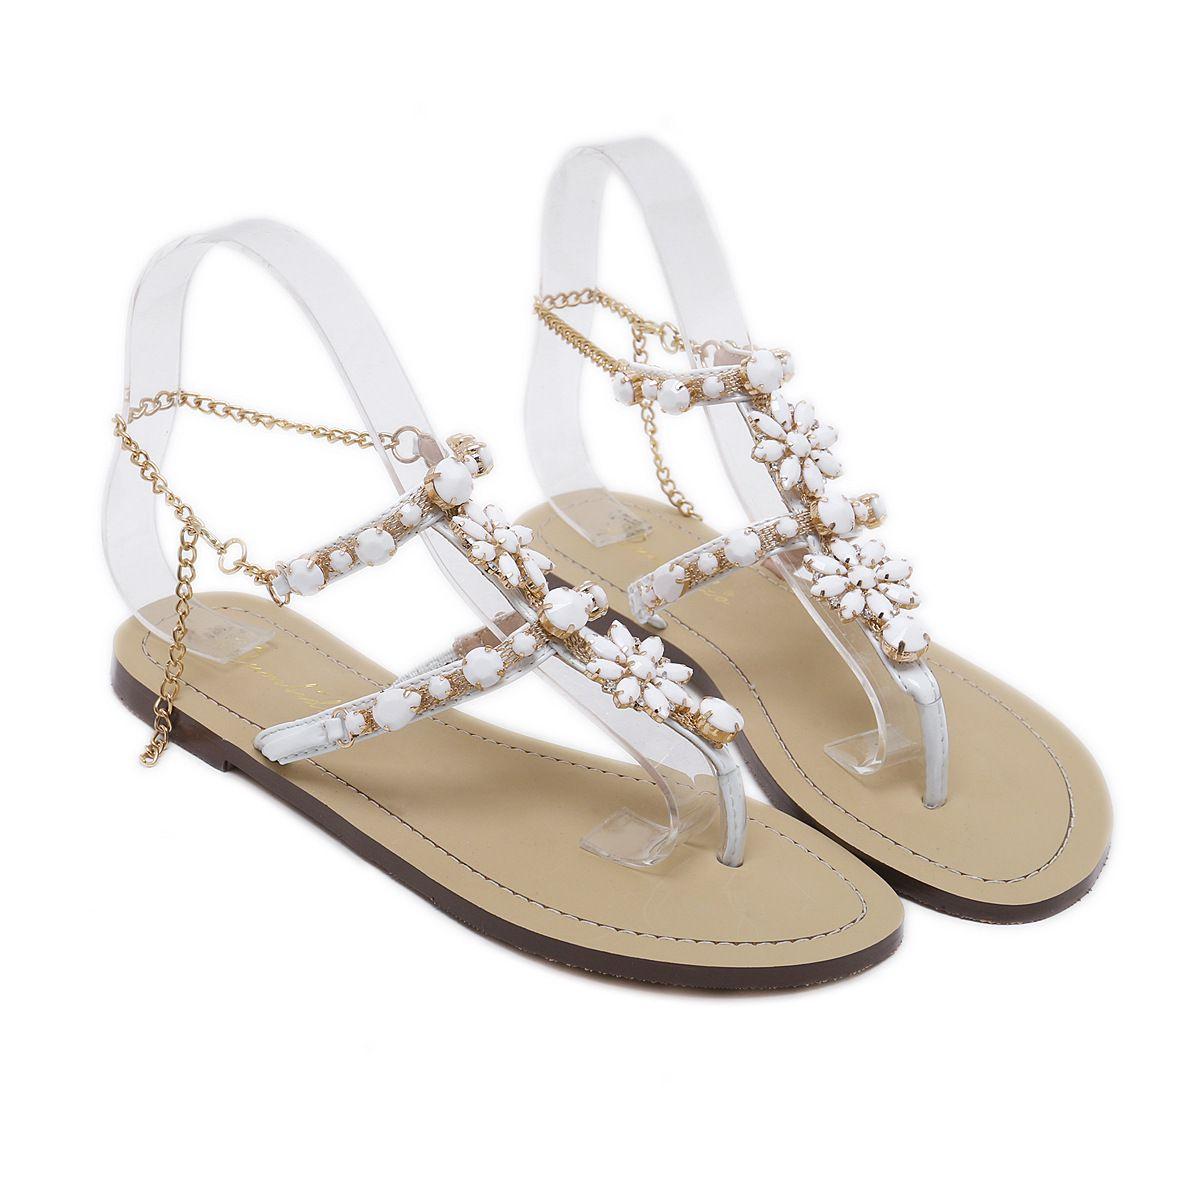 Stunning Bling Bling Woman Sandals Women Shoes Rhinestones Chains Thong Gladiator Flat Sandals Crystal Chaussure Plus Size 46 Tenis Feminino